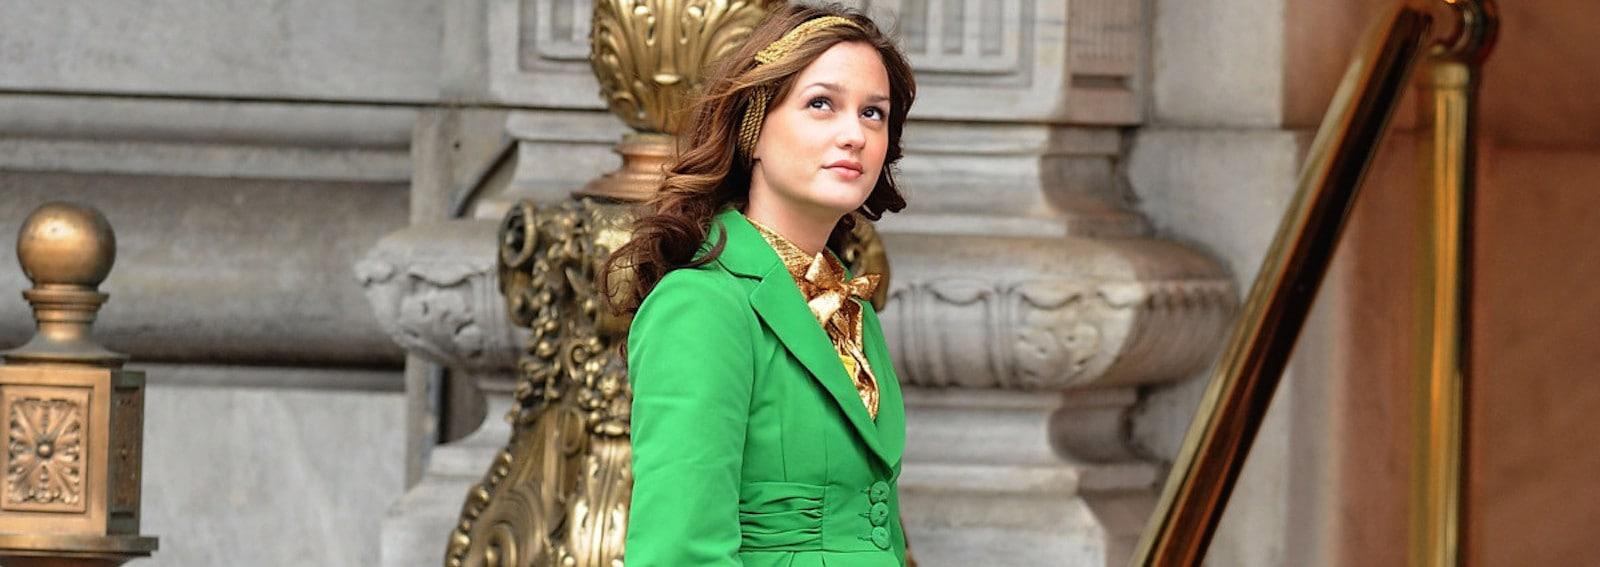 Blair Waldorf giacca verde